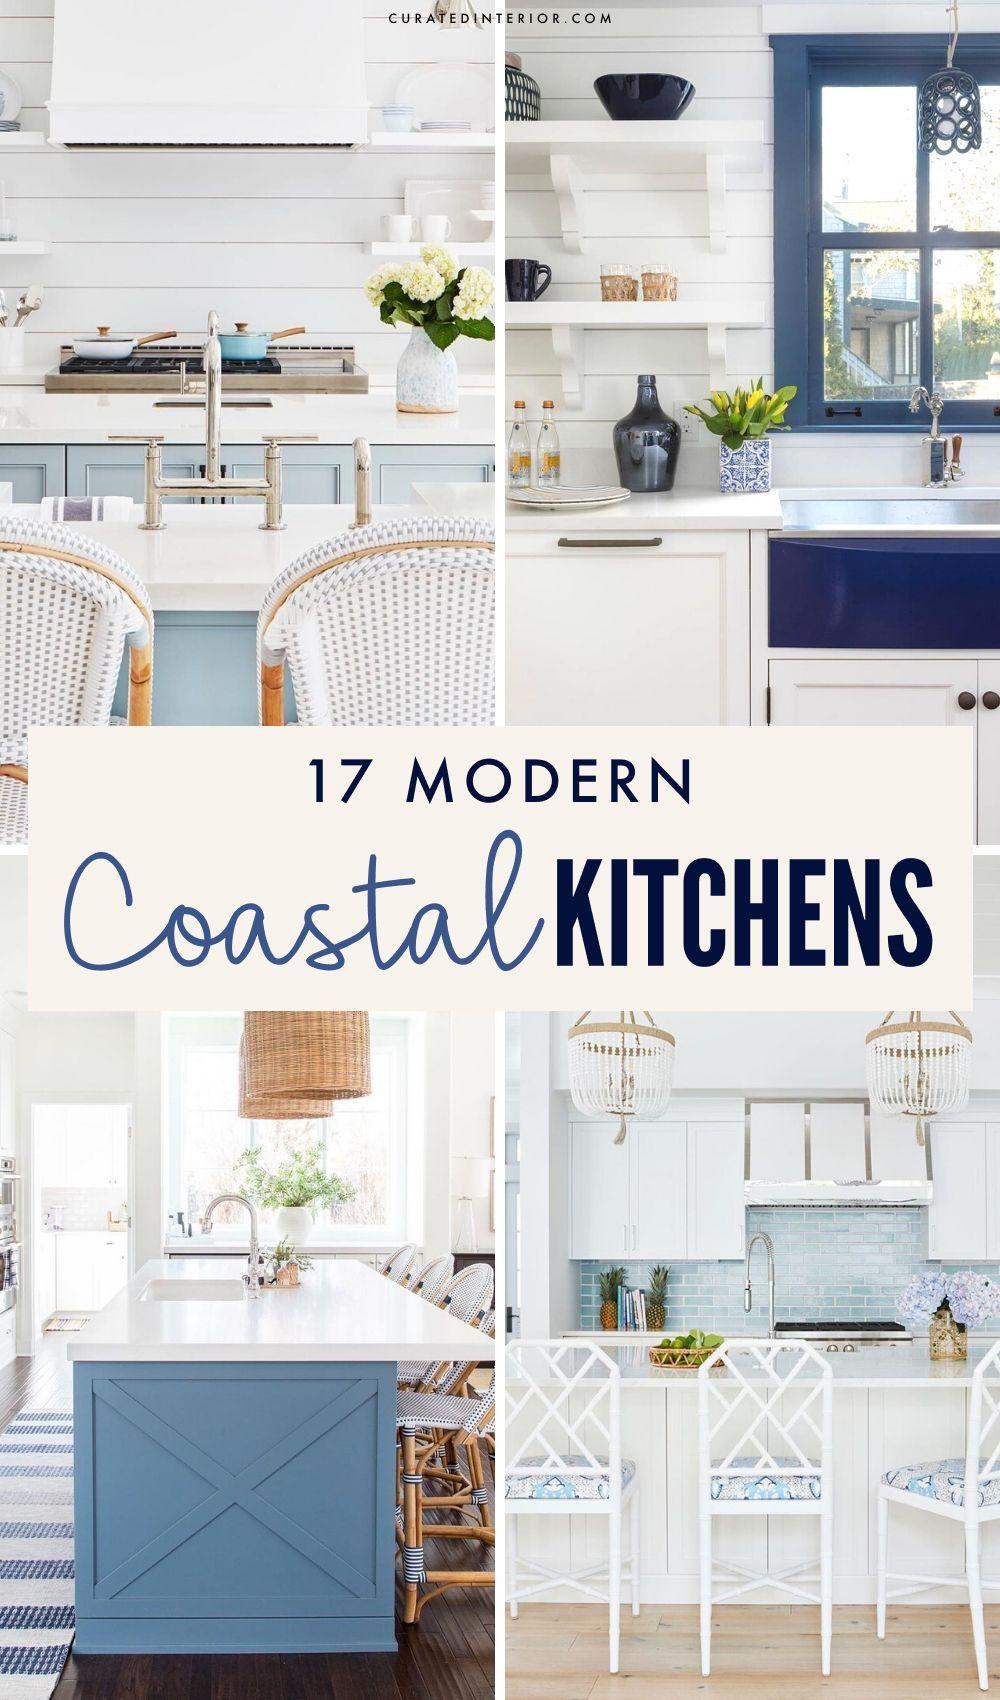 17 Coastal Kitchen Decor Ideas For A Beach Home Coastal Kitchen Decor Coastal Kitchen Beach House Kitchens